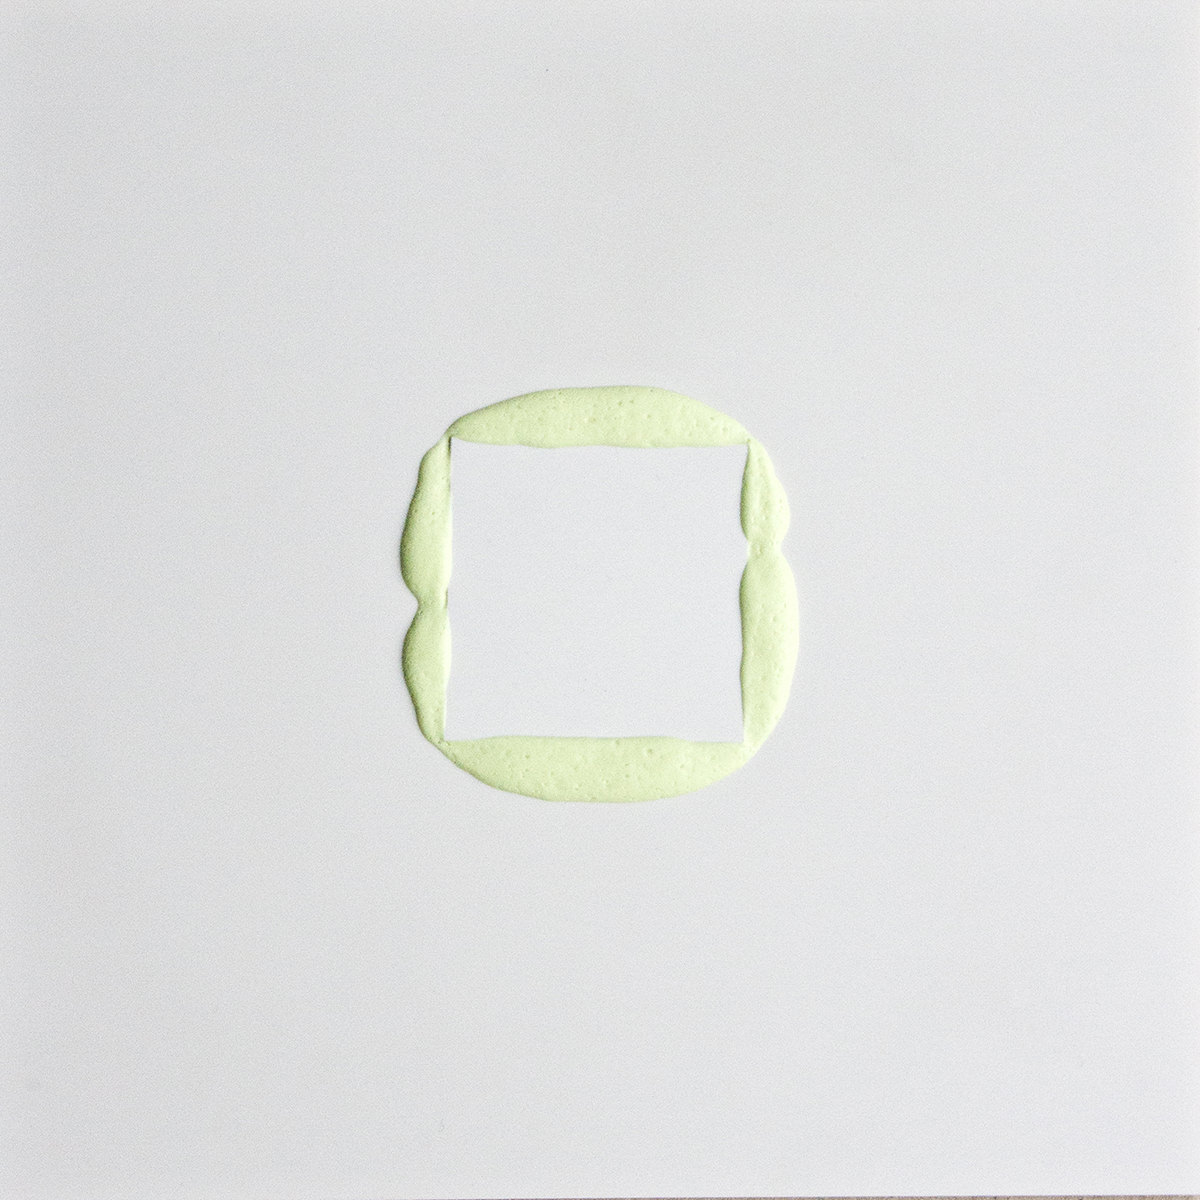 aus der Serie Squeeze, 2015, acrylic between polystyrol, 25 x 25 cm